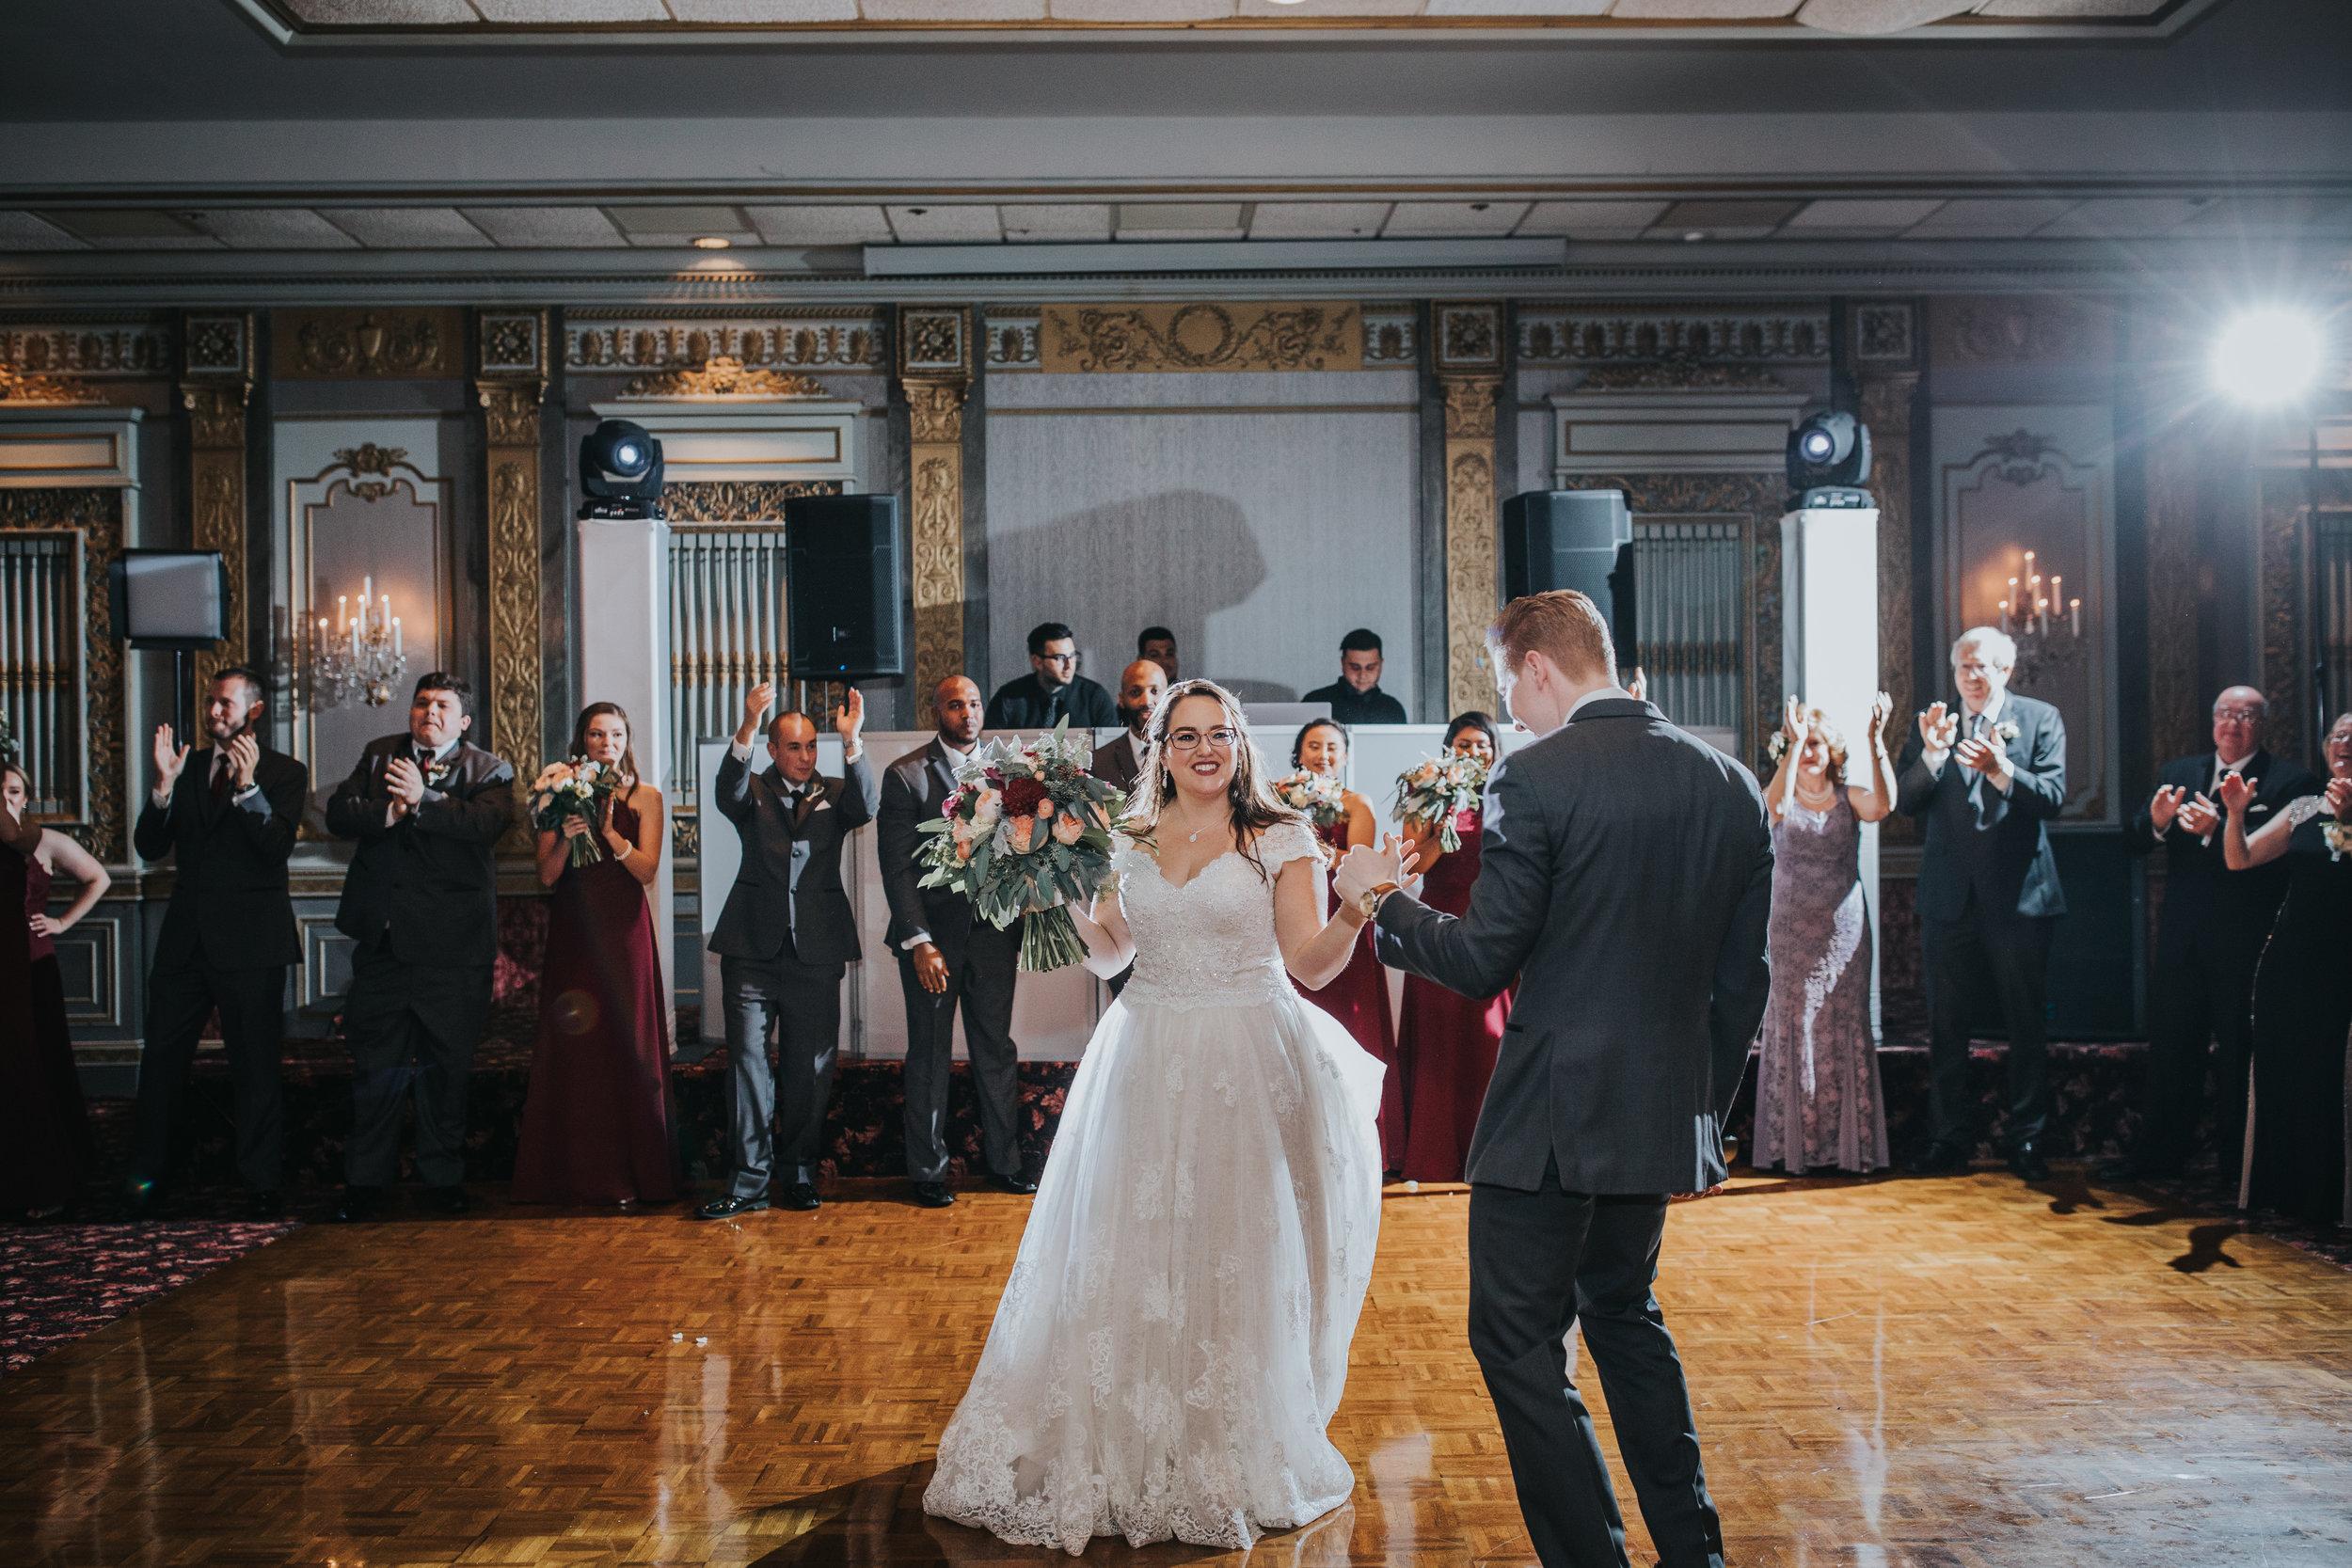 New-Jersey-Wedding-Photography-Fishers-Tudor-House-JennaLynnPhotography-Reception-Kathleen&Eddie-11.jpg